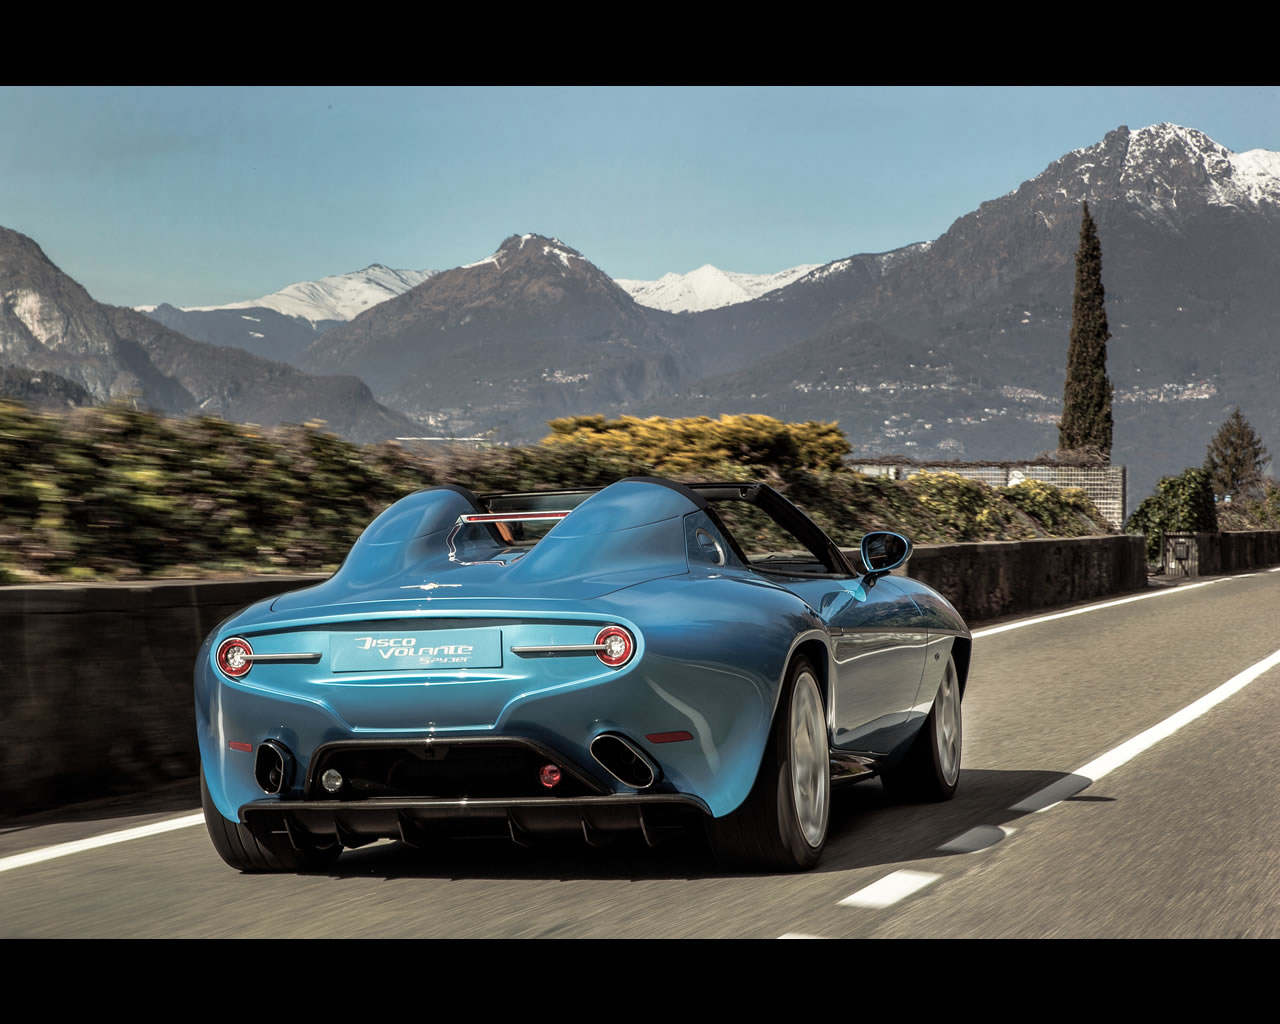 Touring Disco Volante >> Alfa Romeo Disco Volante Spyder Touring Superleggera 2016